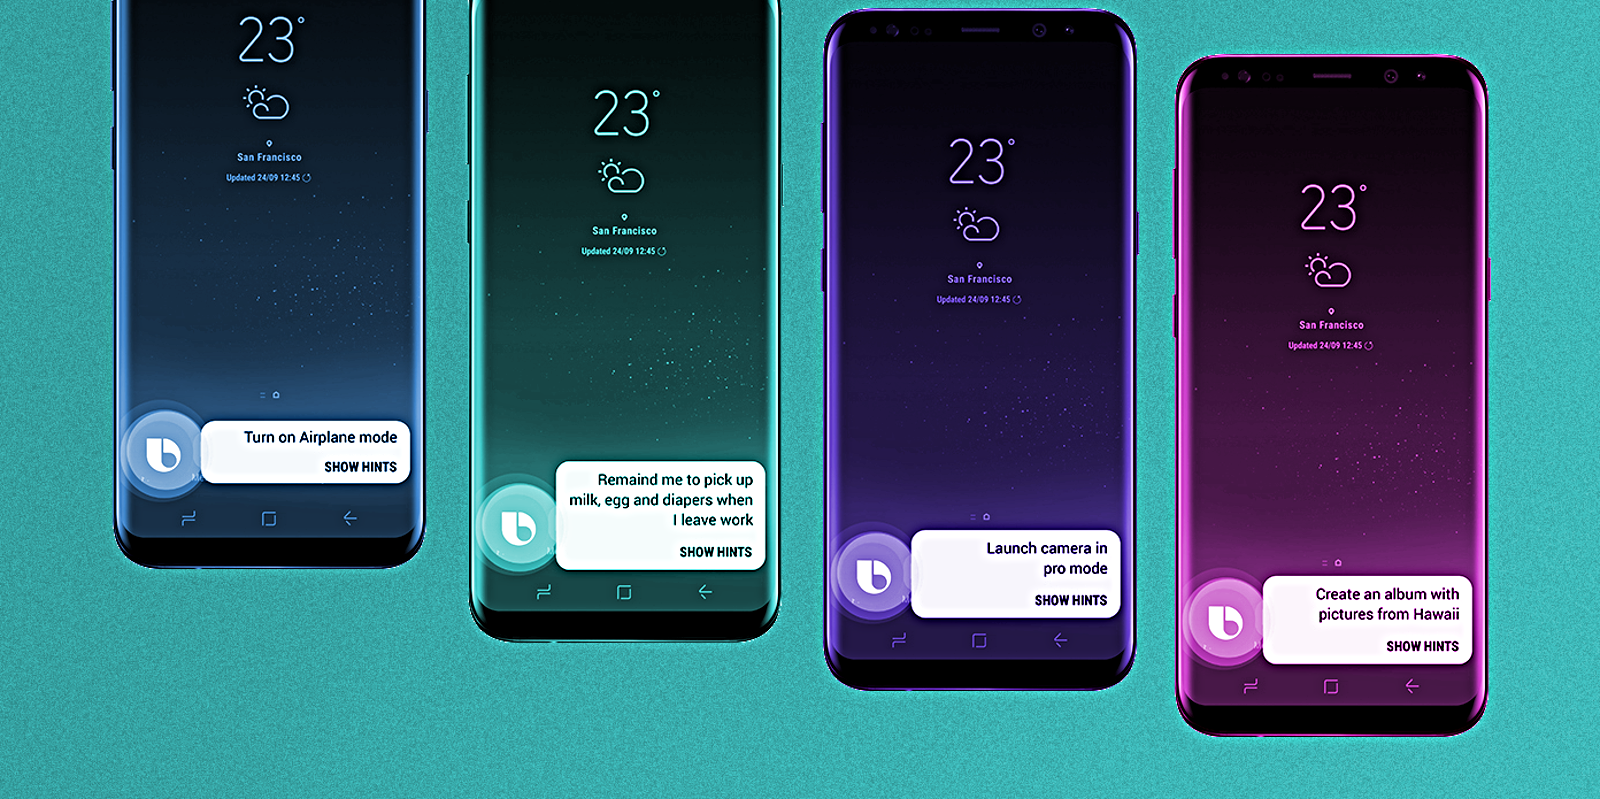 BIXBY-VOICE-Samsung Galaxy S8